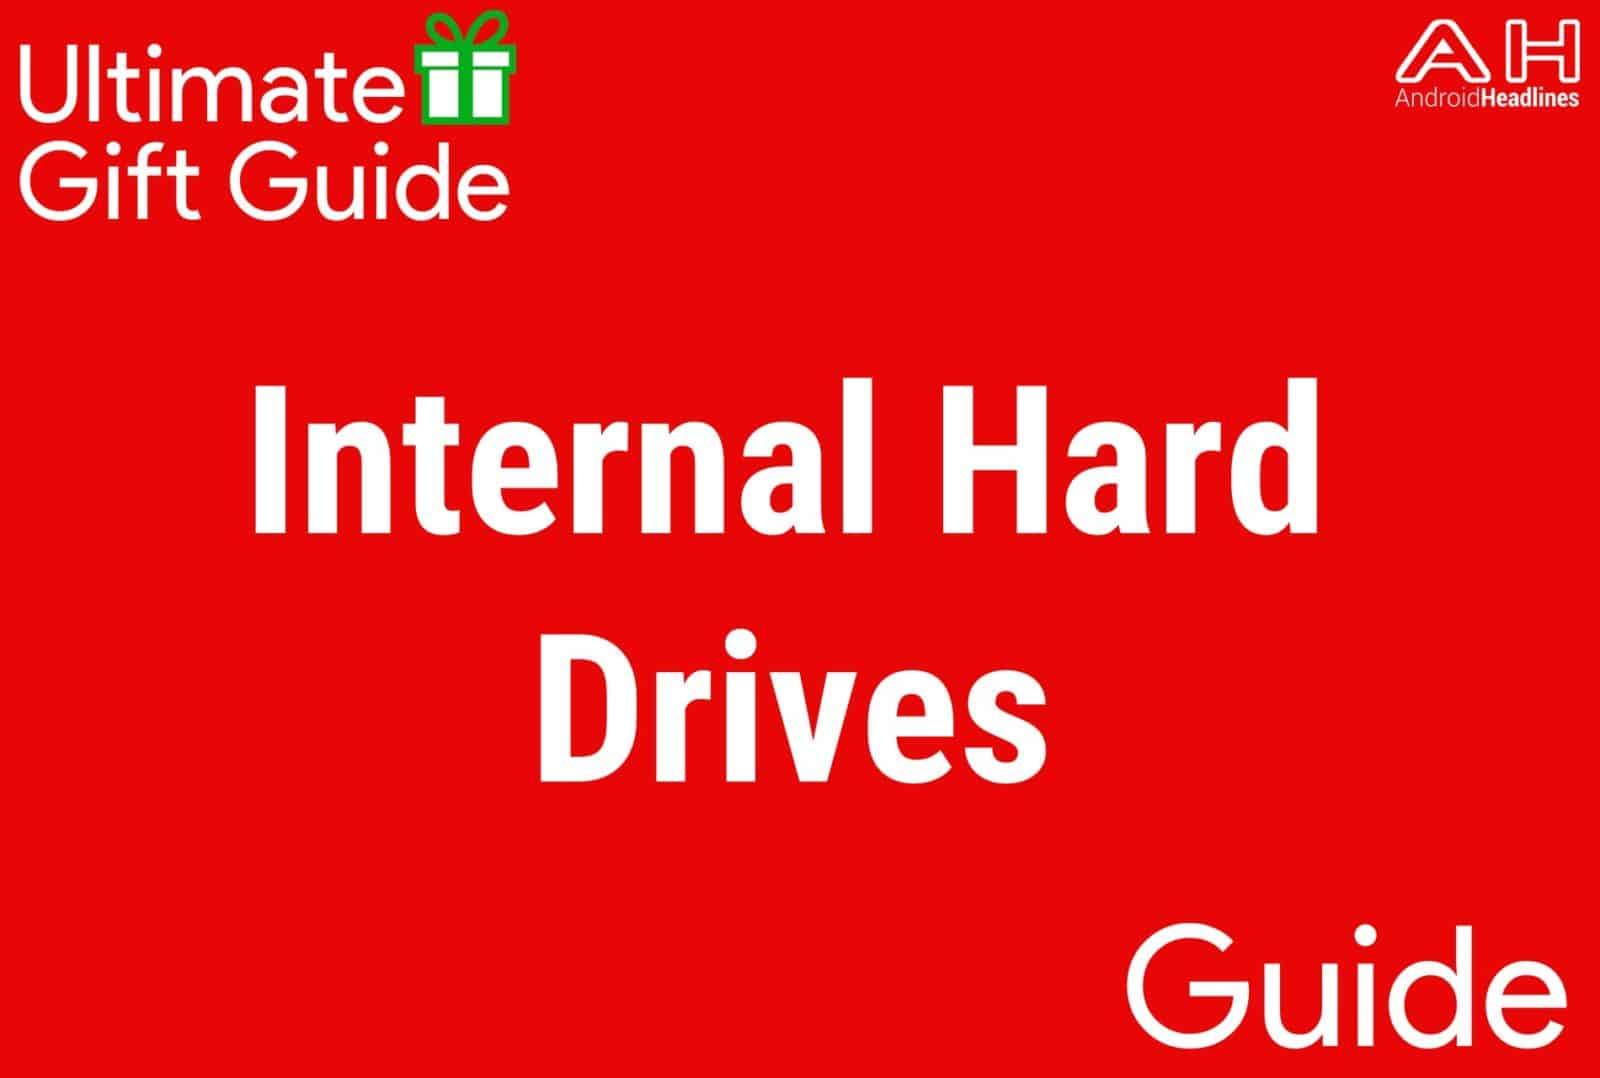 Internal Hard Drives - Gift Guide 2015-2016